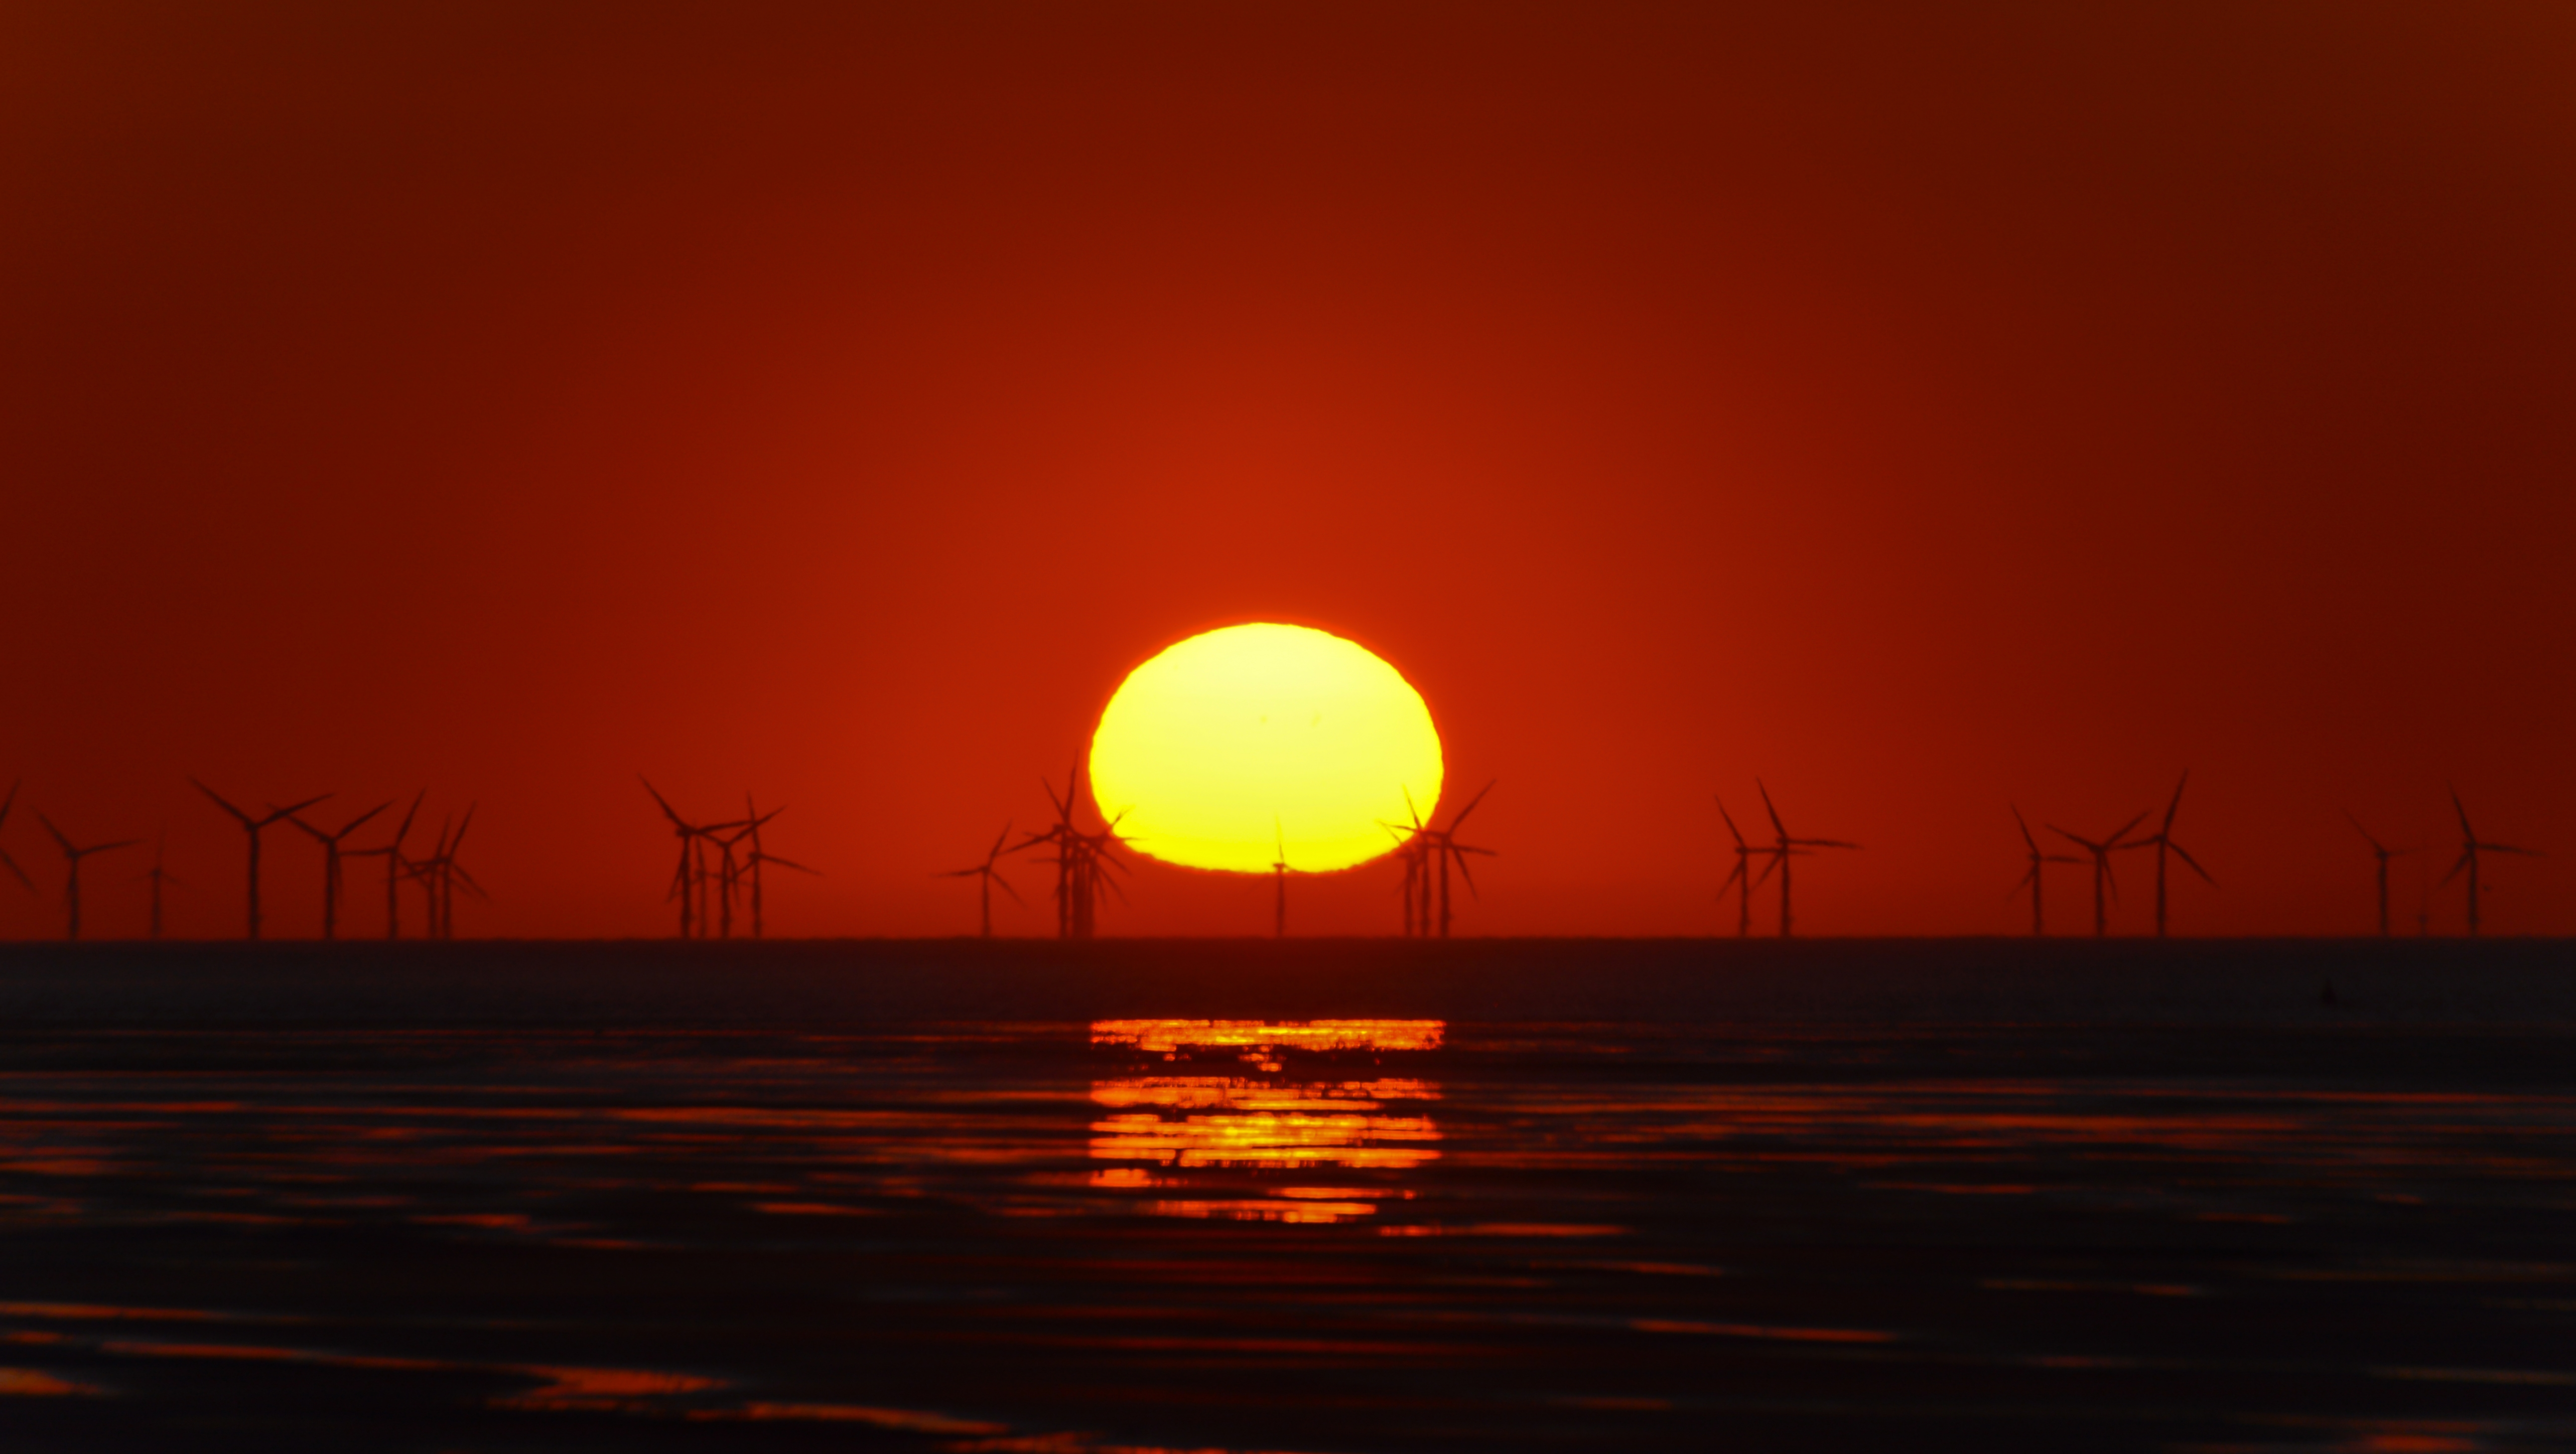 solar storm may 28th 2019 - photo #47